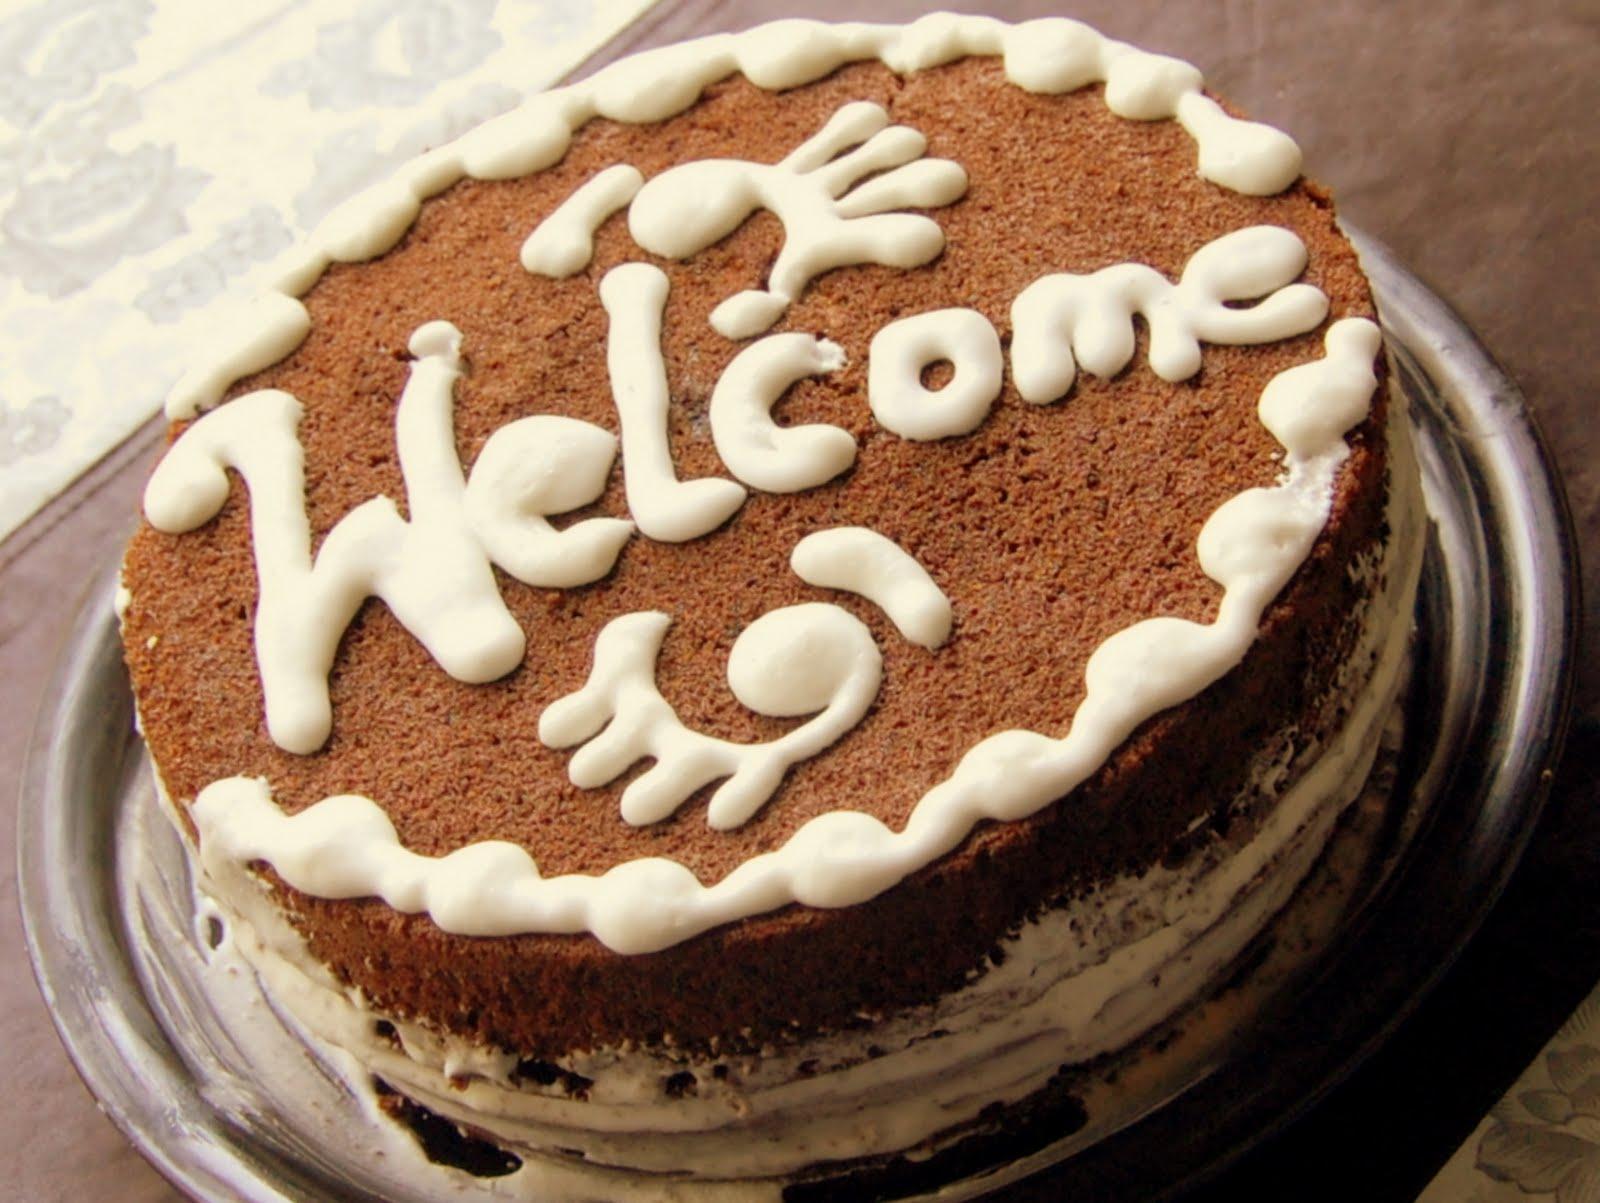 My World: Wilton Cake Decorating Class